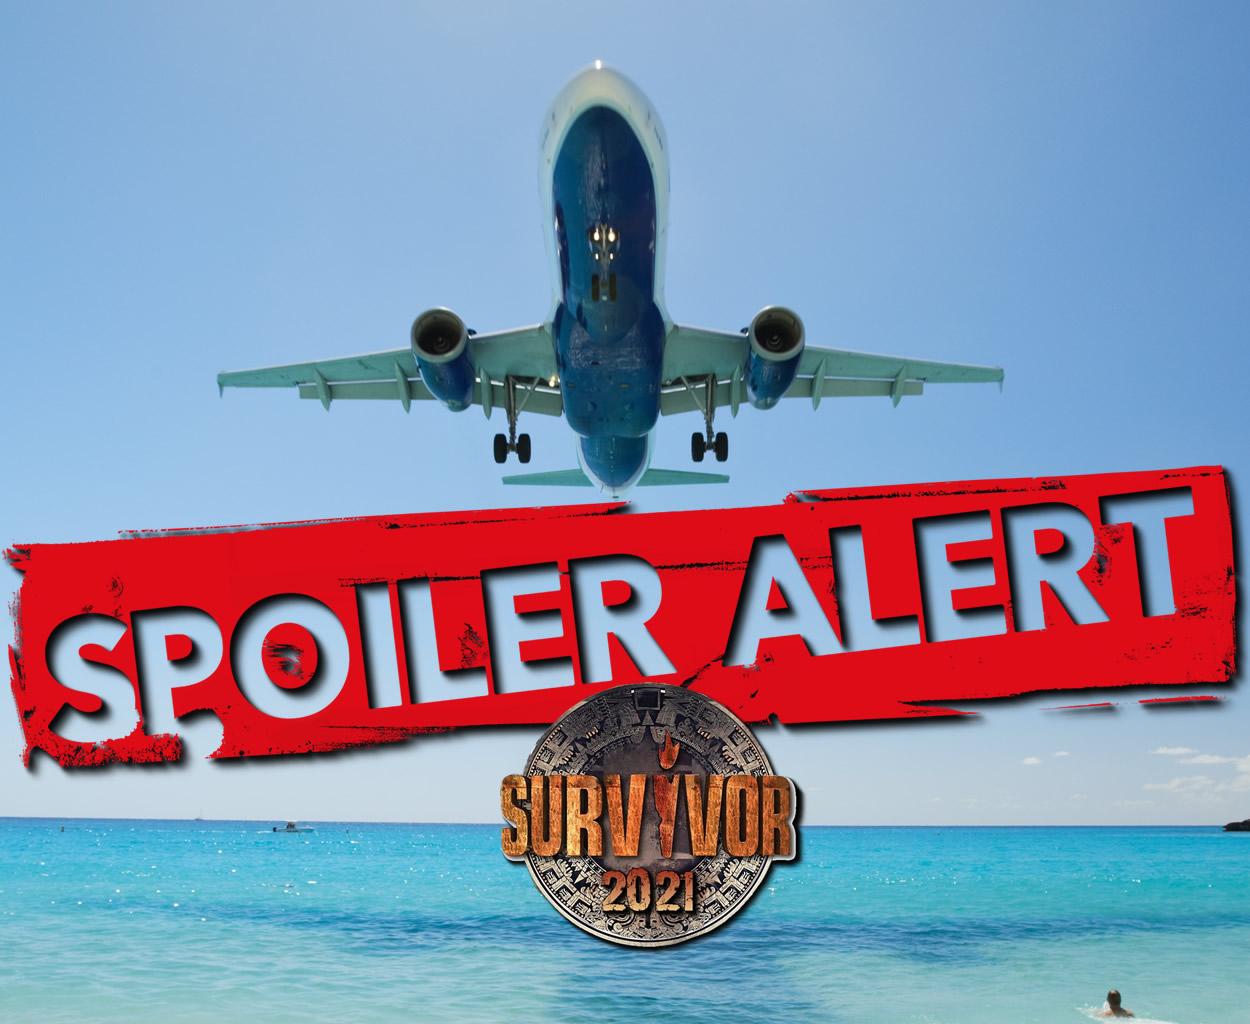 Survivor spoiler 21.04.21: Αυτό ήταν το ΤΕΛΟΣ! Αποχώρηση που θα κάνει μπαμ! (video)